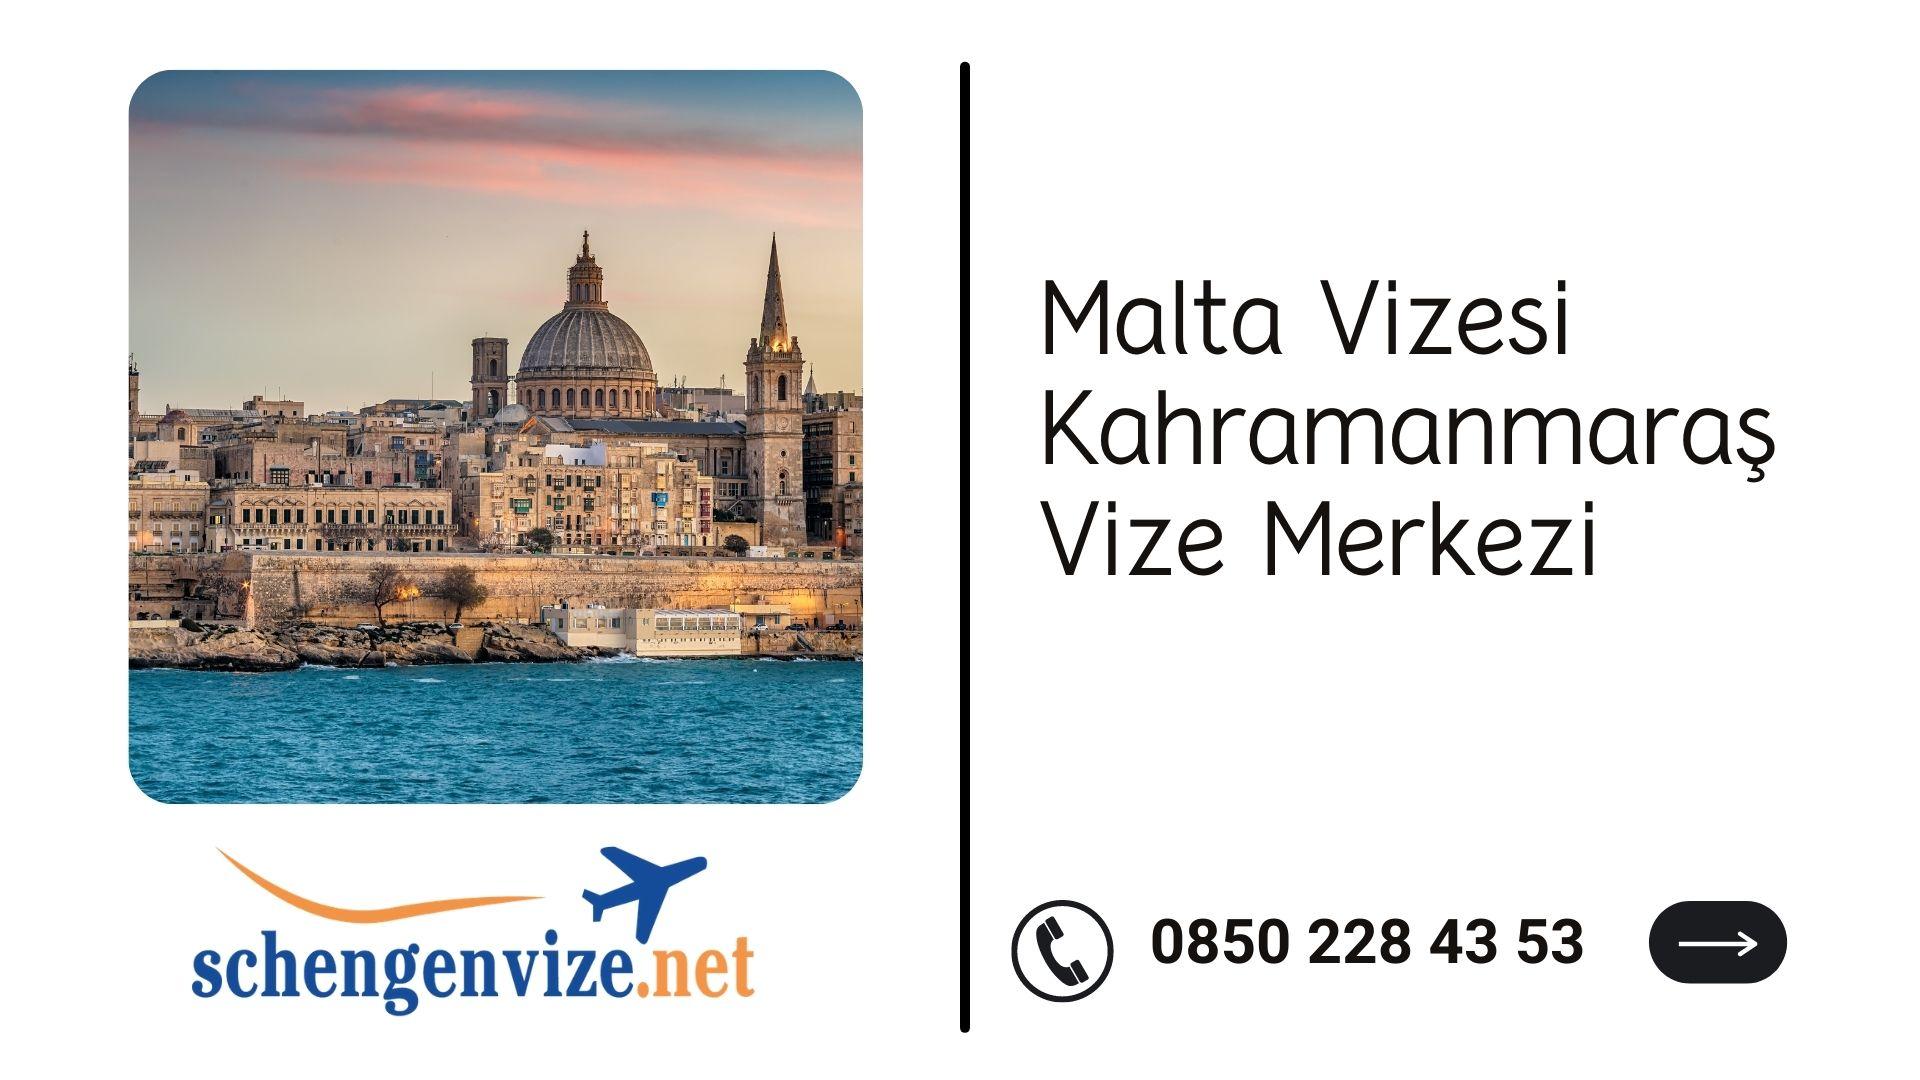 Malta Vizesi Kahramanmaraş Vize Merkezi